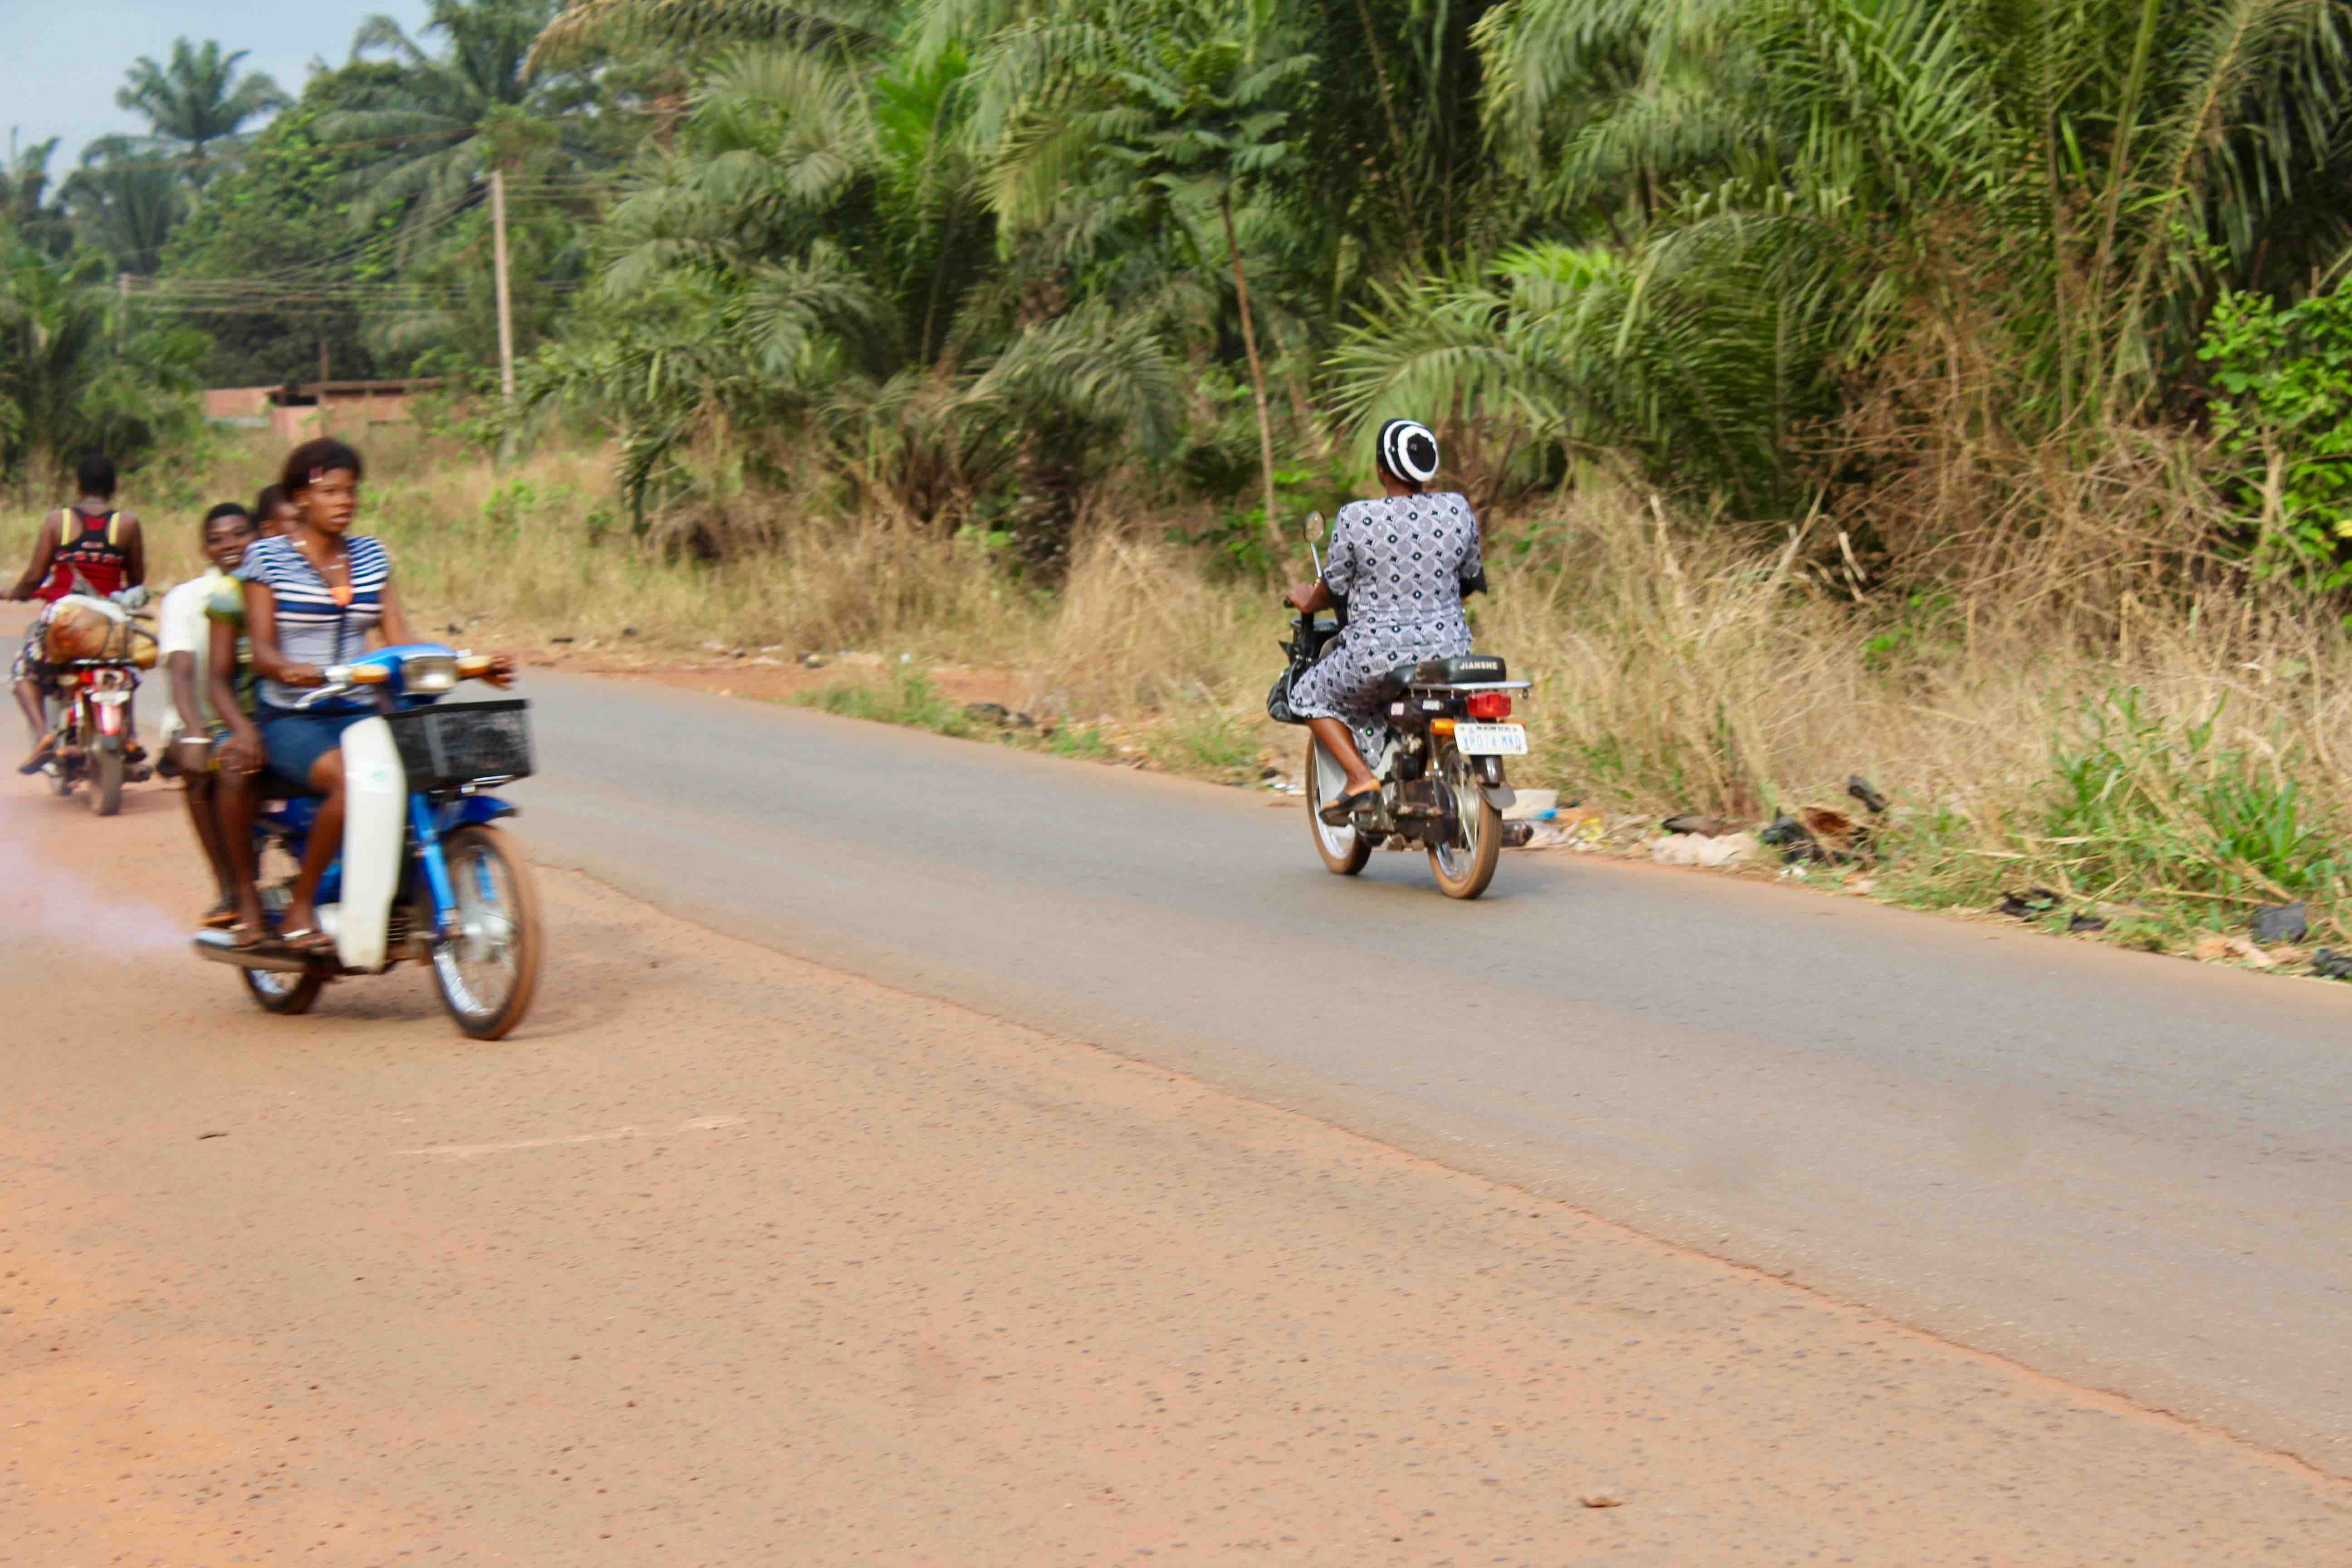 Igbo Women, Motorcycling, Obolo Village, Enugu State, Nigeria, #JujuFilms